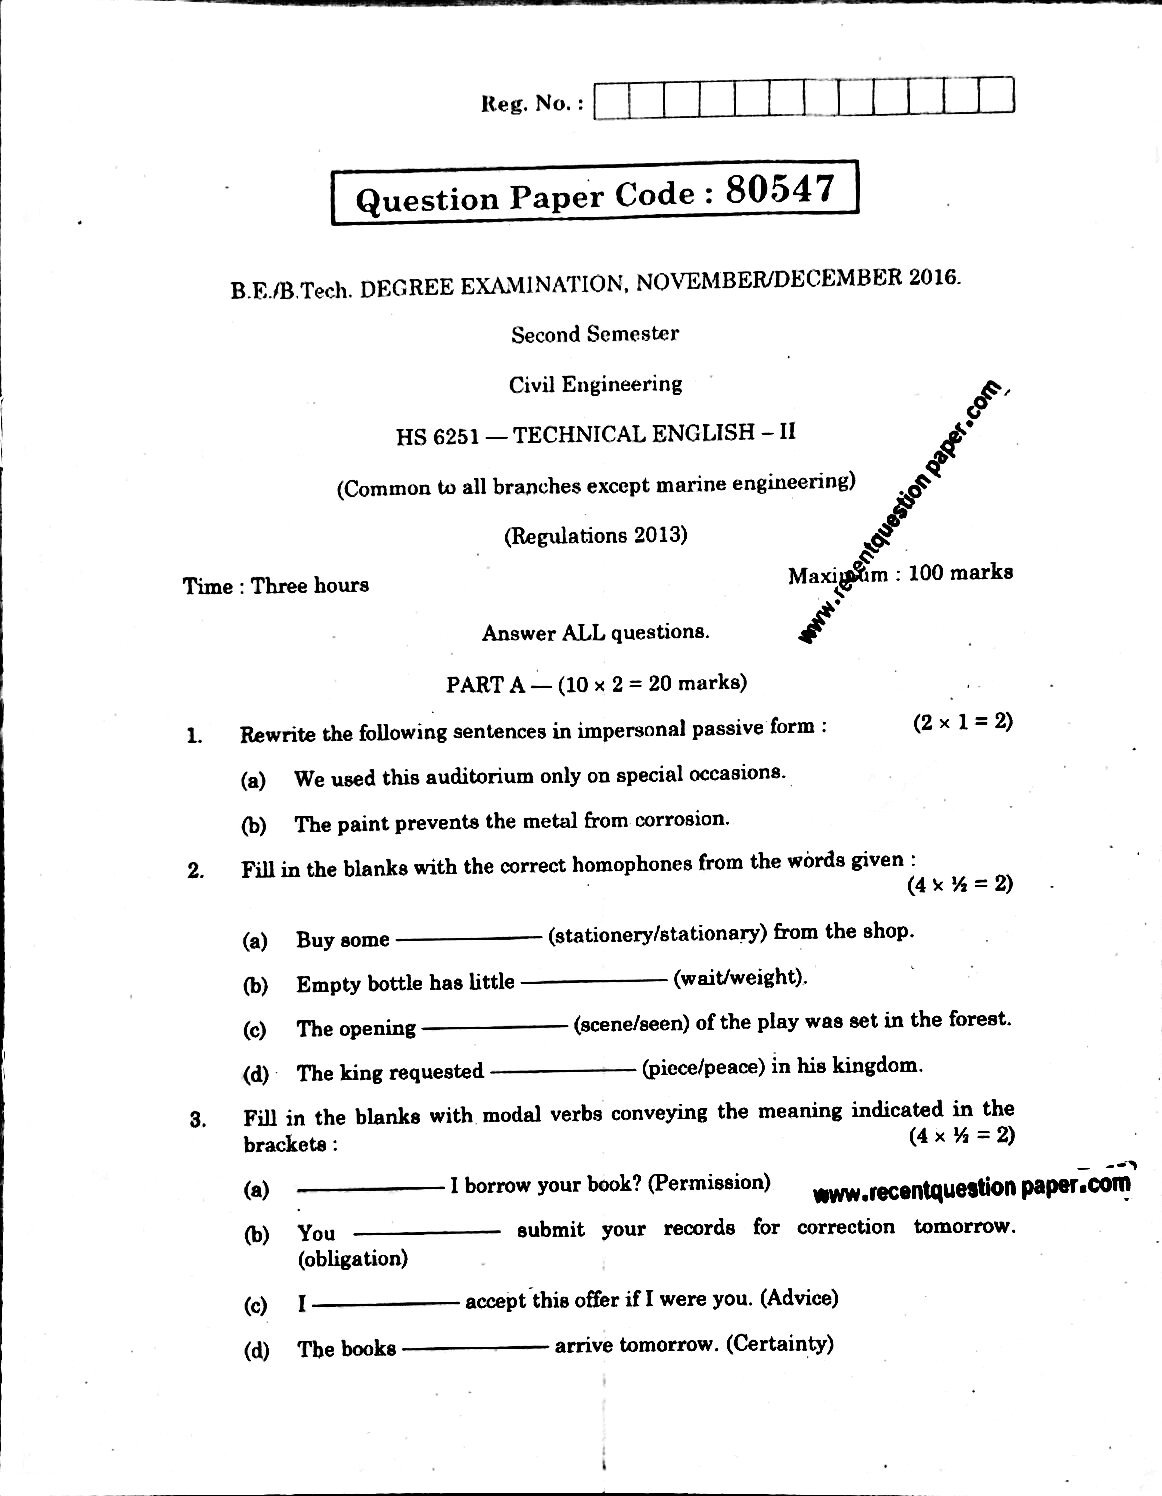 Hs6251 technical english ii novdec 2016 anna university question paper hs6251 technical english ii malvernweather Gallery